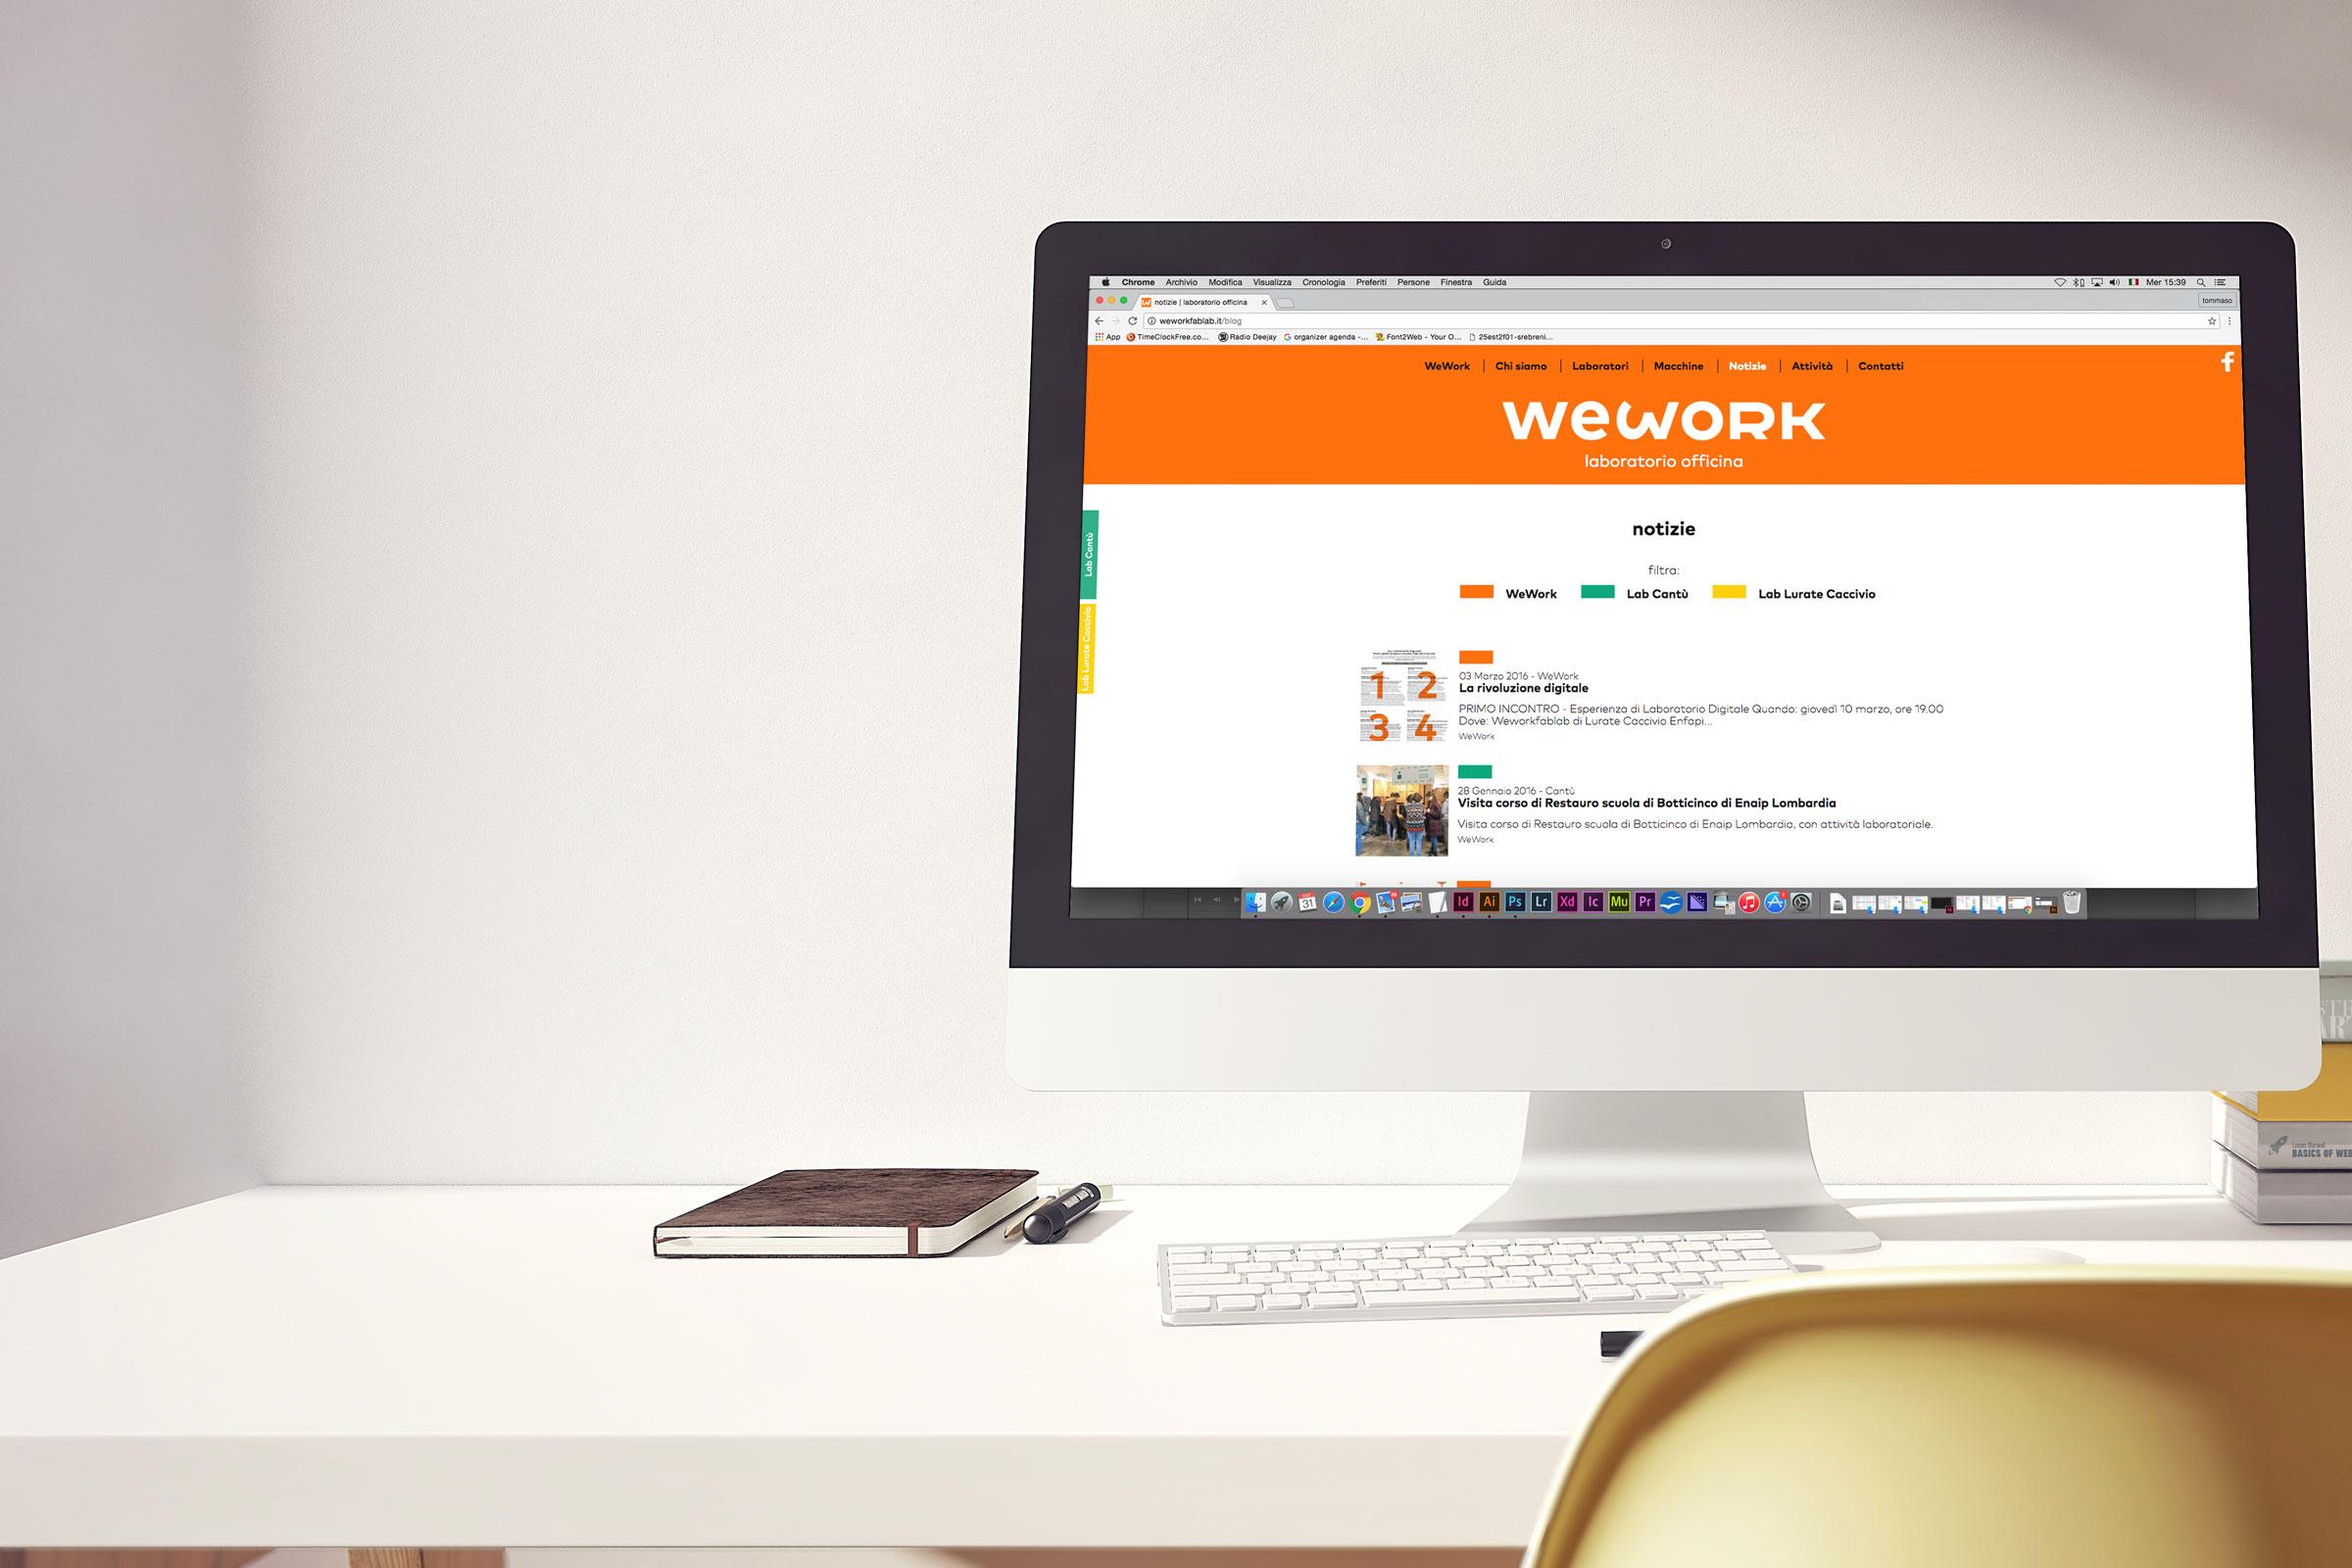 sito internet responsive desktop